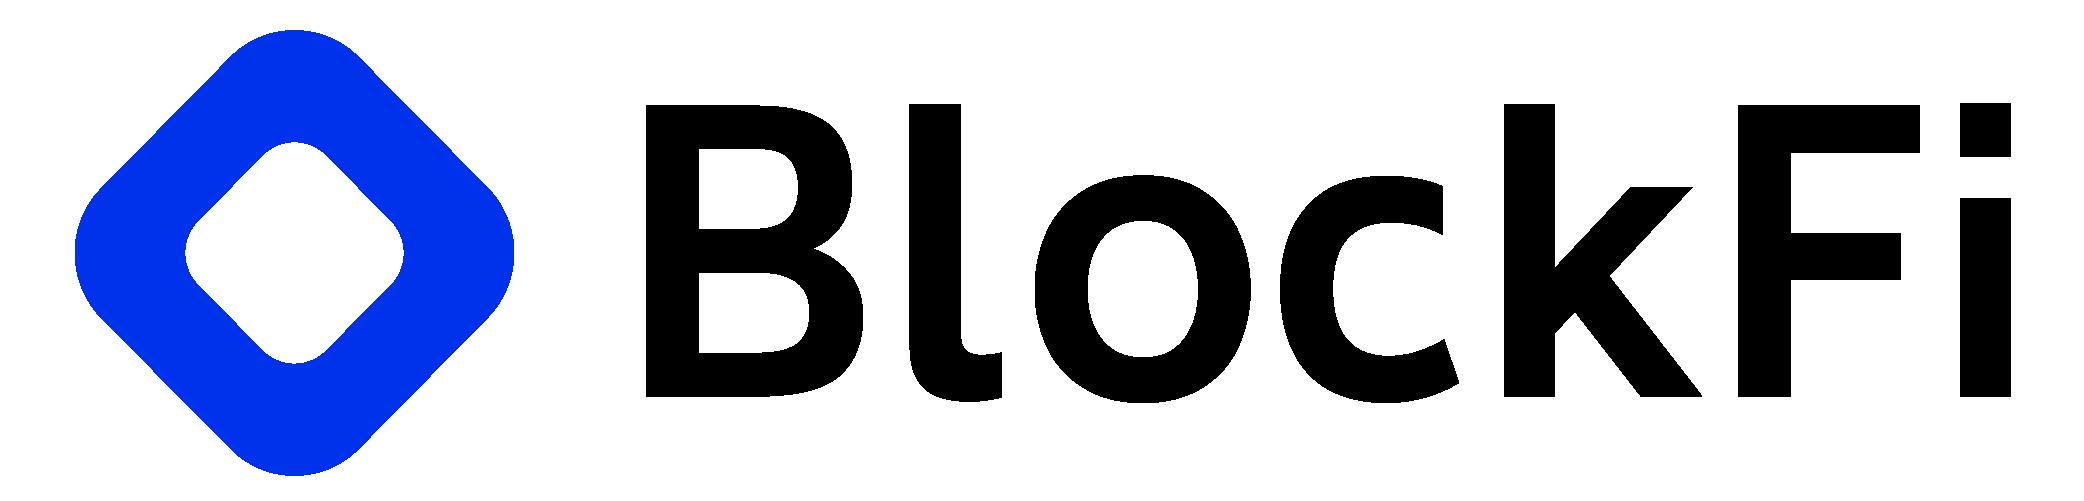 BlockFi ?u=https%3A%2F%2Fwww.finimize.com%2Fwp%2Fwp-content%2Fuploads%2F2020%2F09%2FBlockFi-Logo-2020_BlockFi-2020-Full-Color-Chris-Fiore